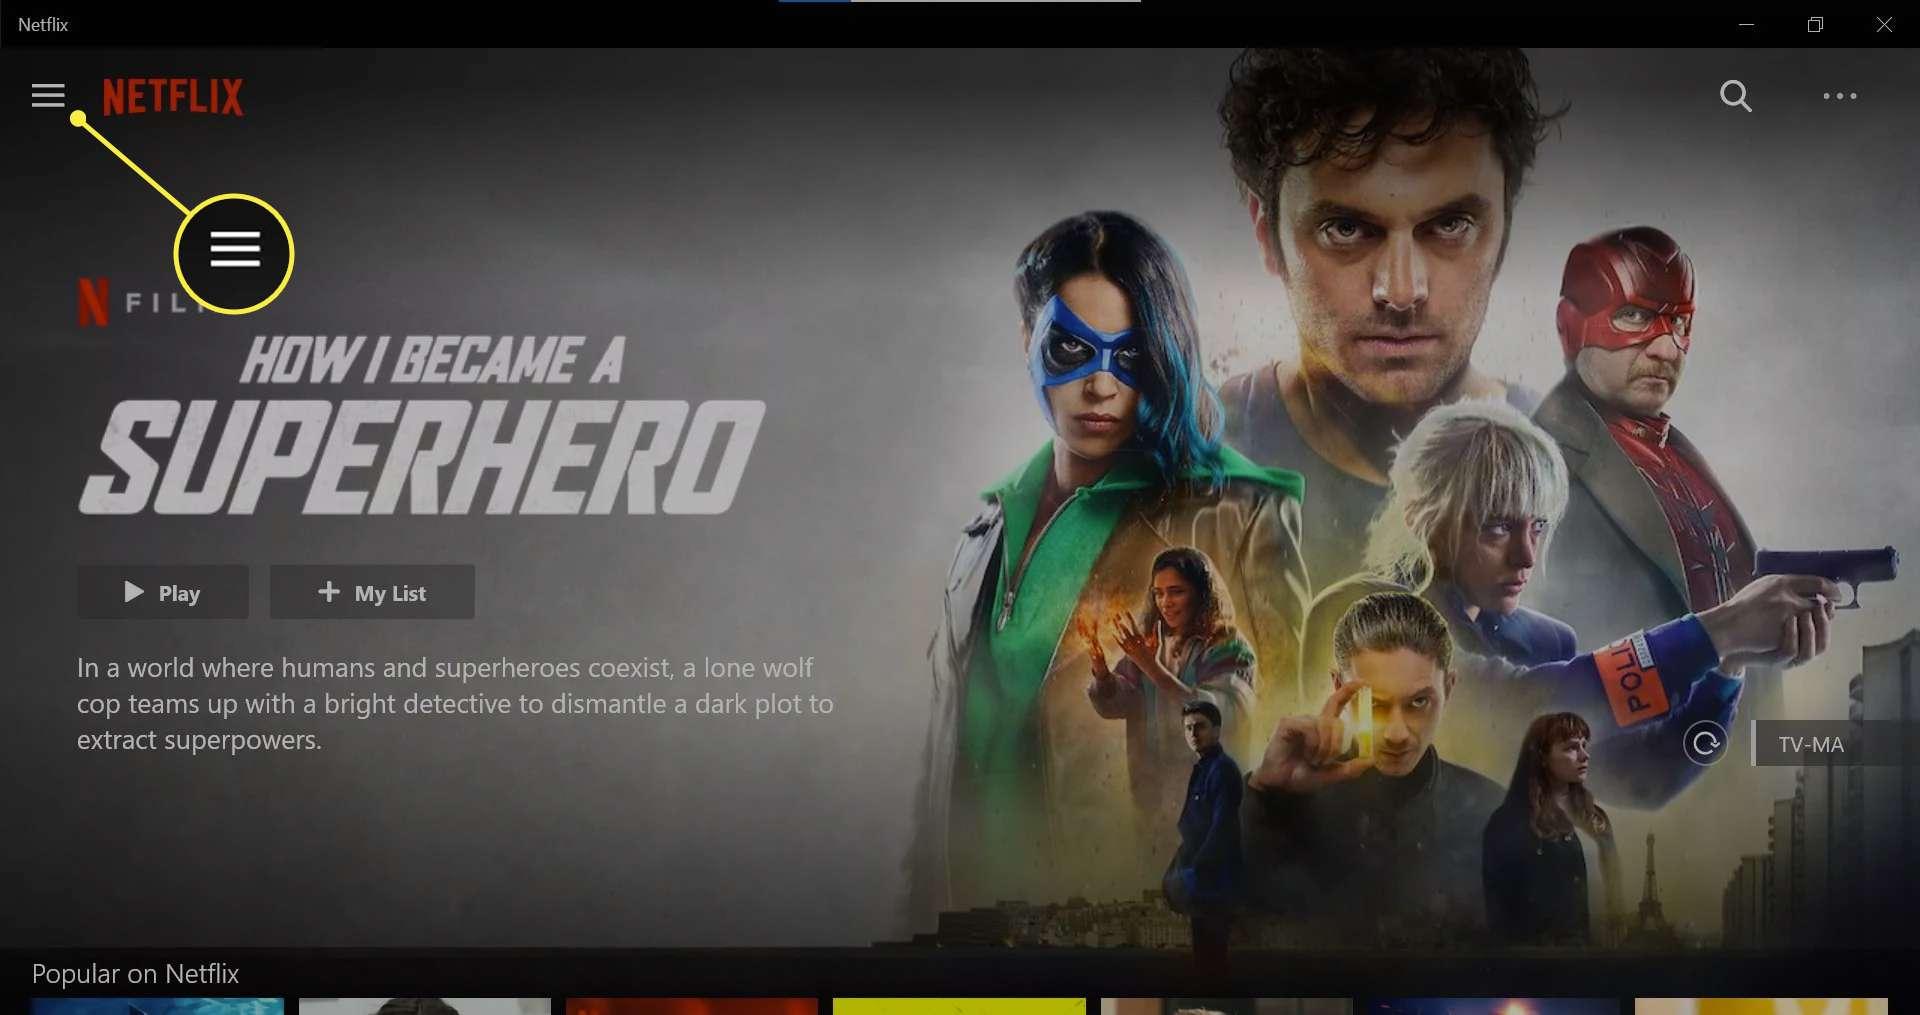 Home menu on Netflix Windows app.